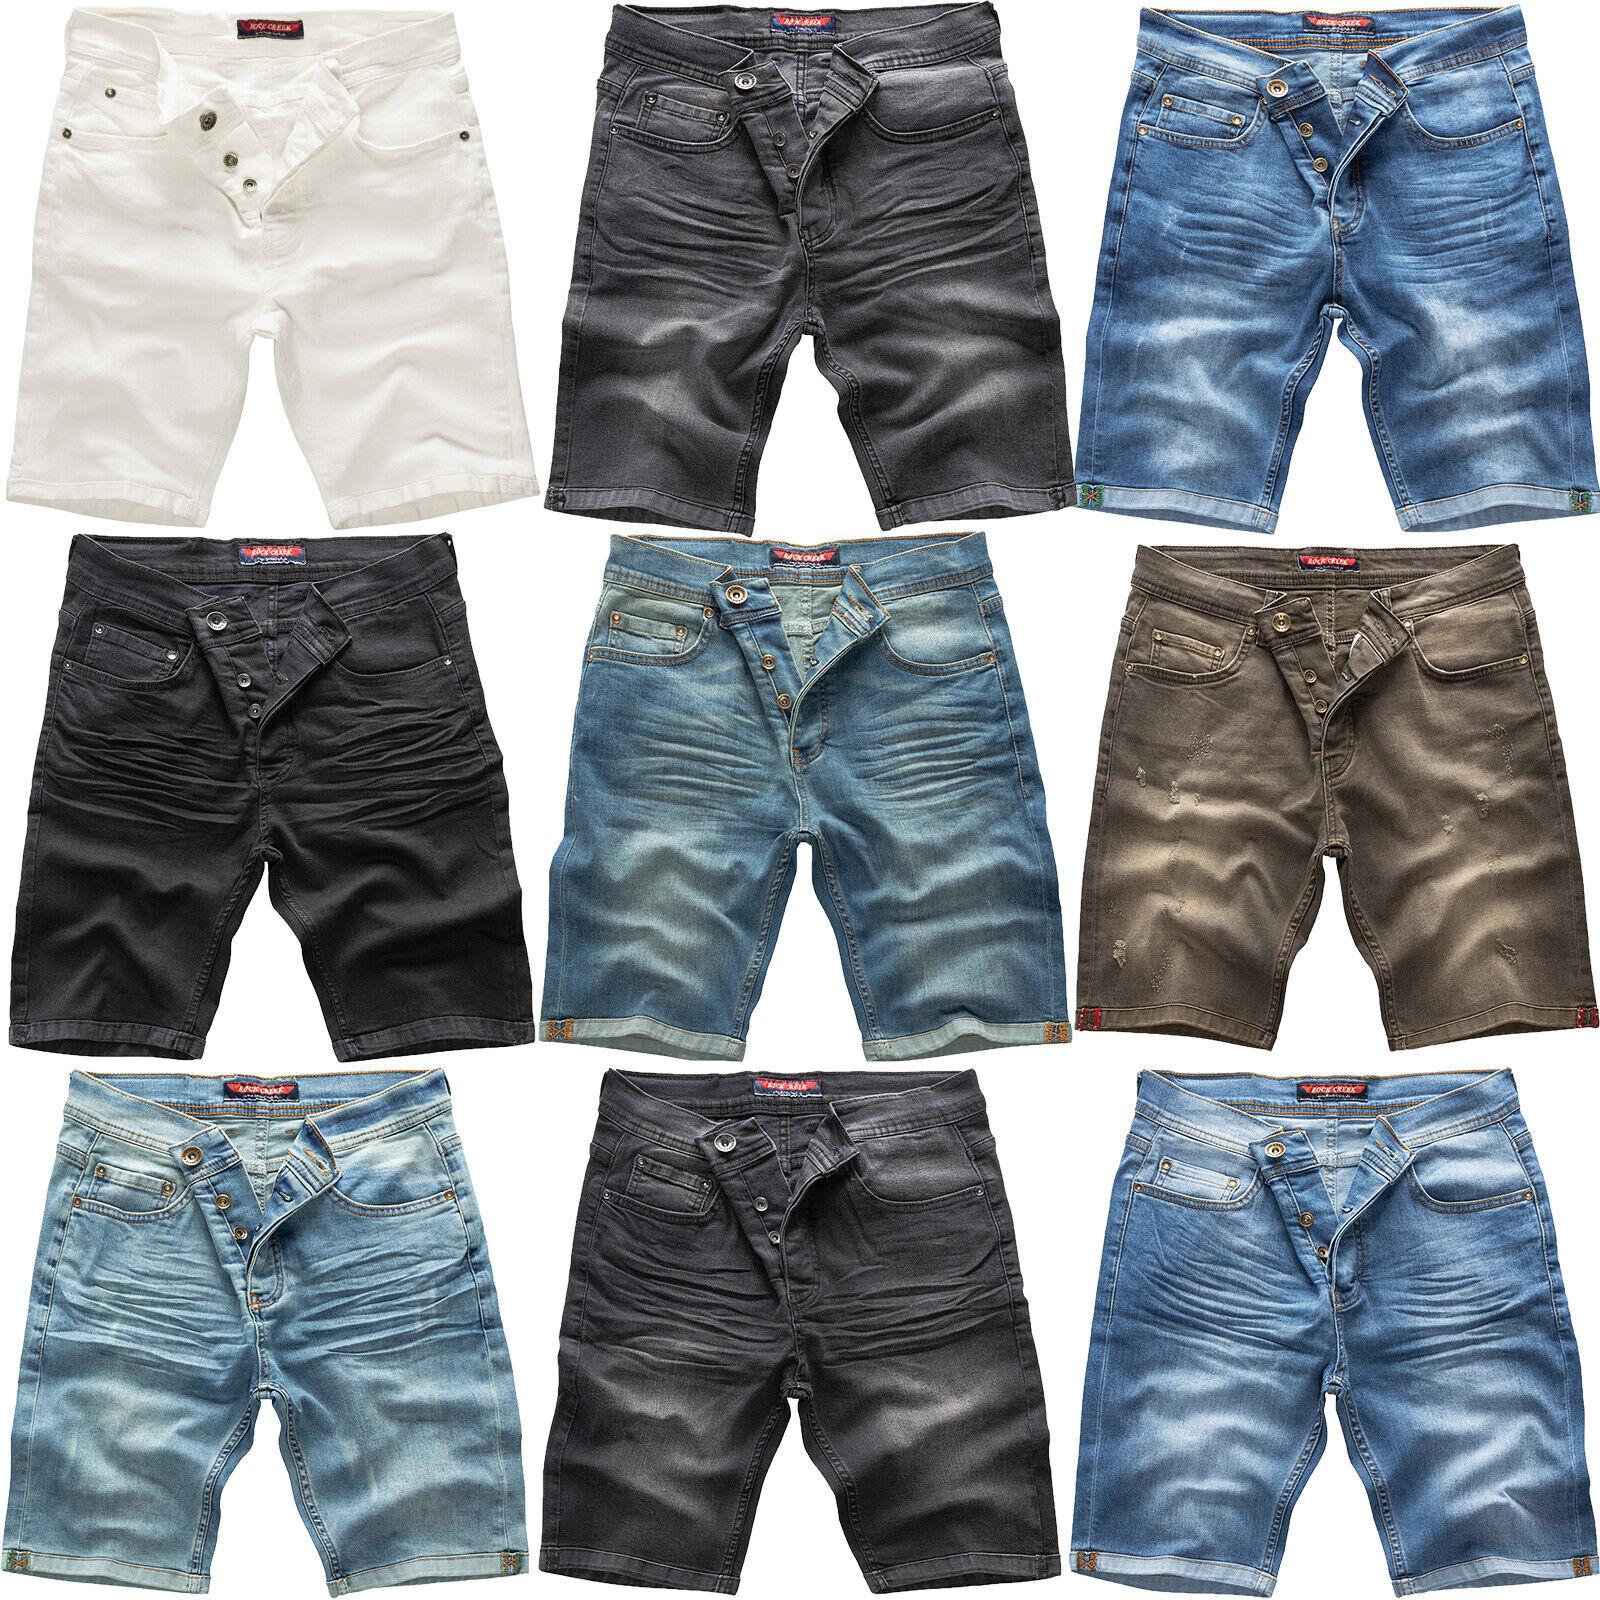 d3382609cd Rock Creek Herren Jeans Short Kurze Bermuda Shorts Hose Denim Stonewashed  M50 ...